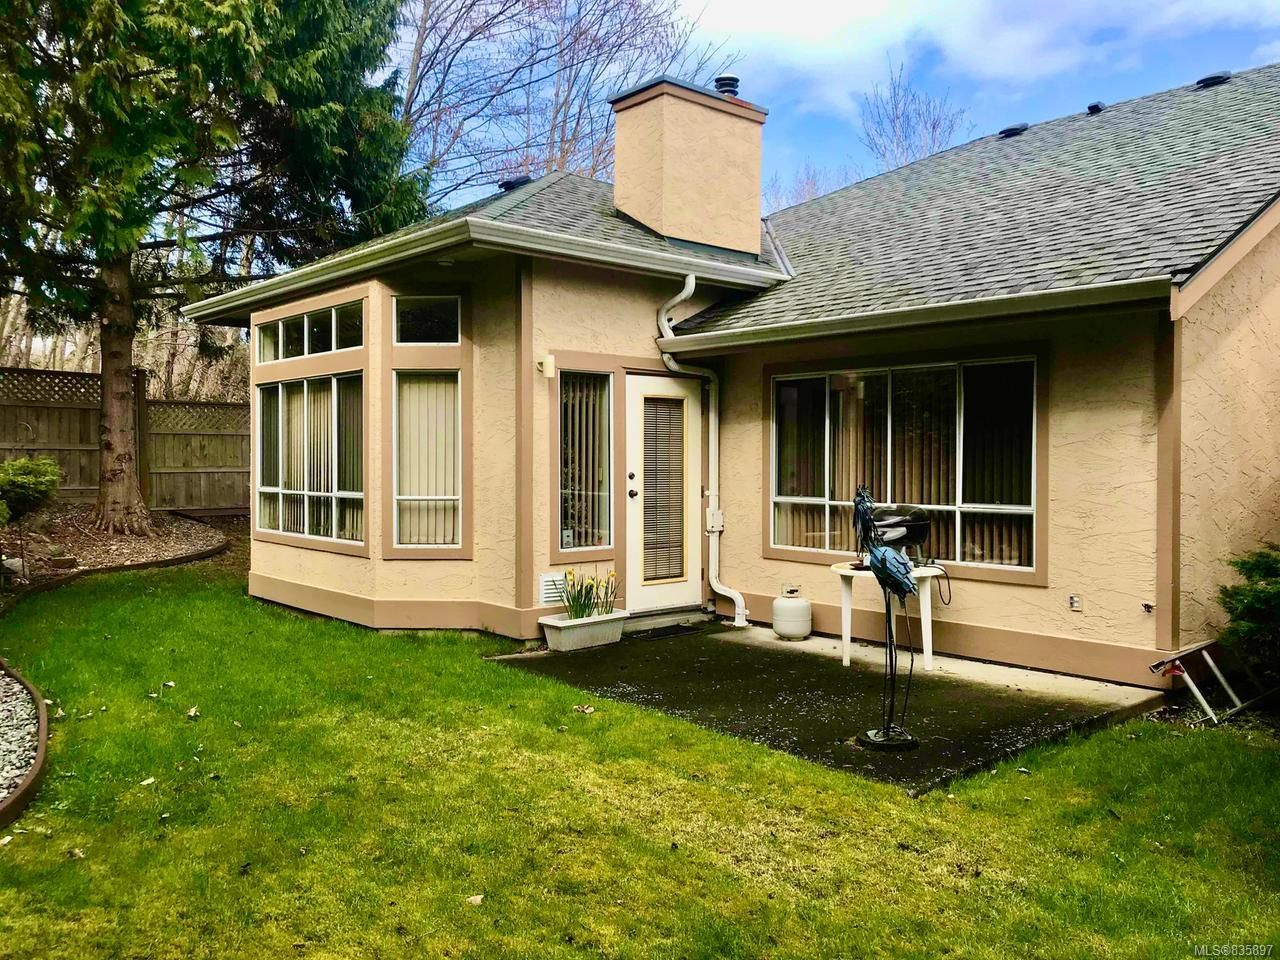 Photo 2: Photos: 2024 Mulligan Way in NANAIMO: Na Departure Bay Row/Townhouse for sale (Nanaimo)  : MLS®# 835897